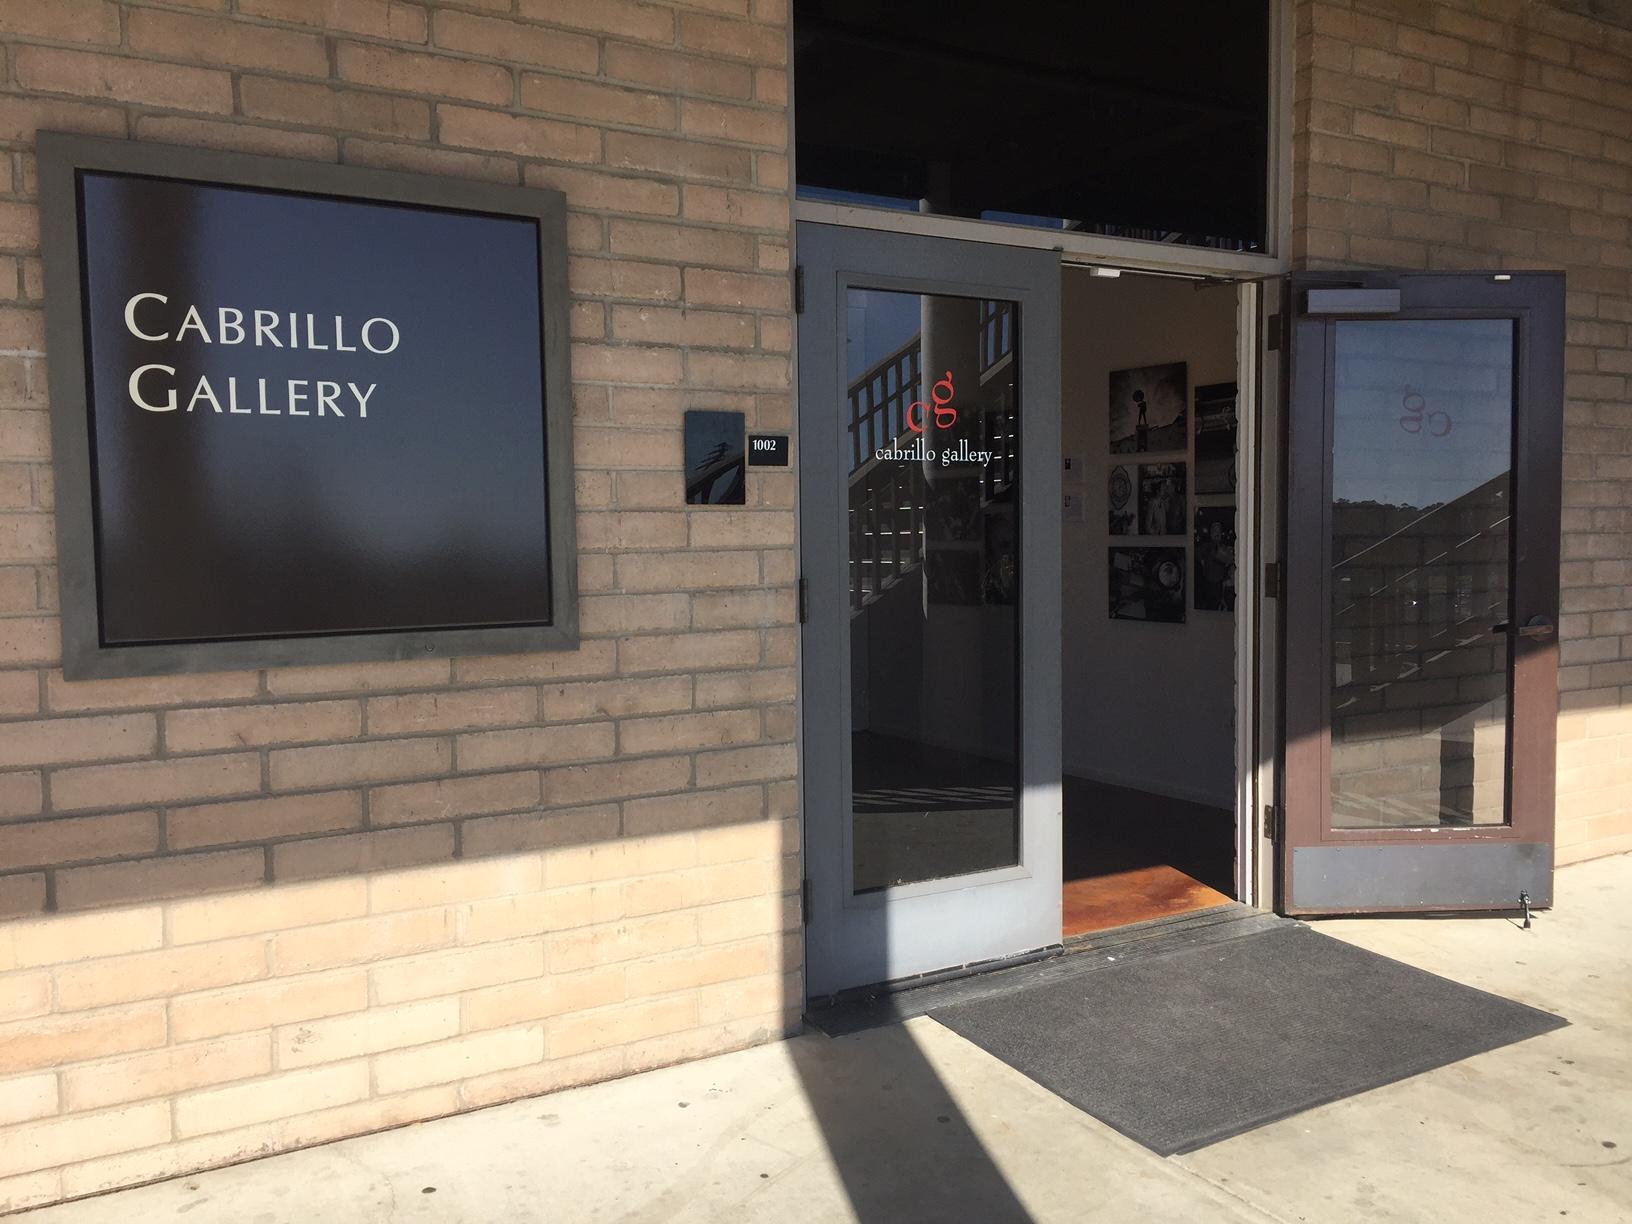 Cabrillo Gallery